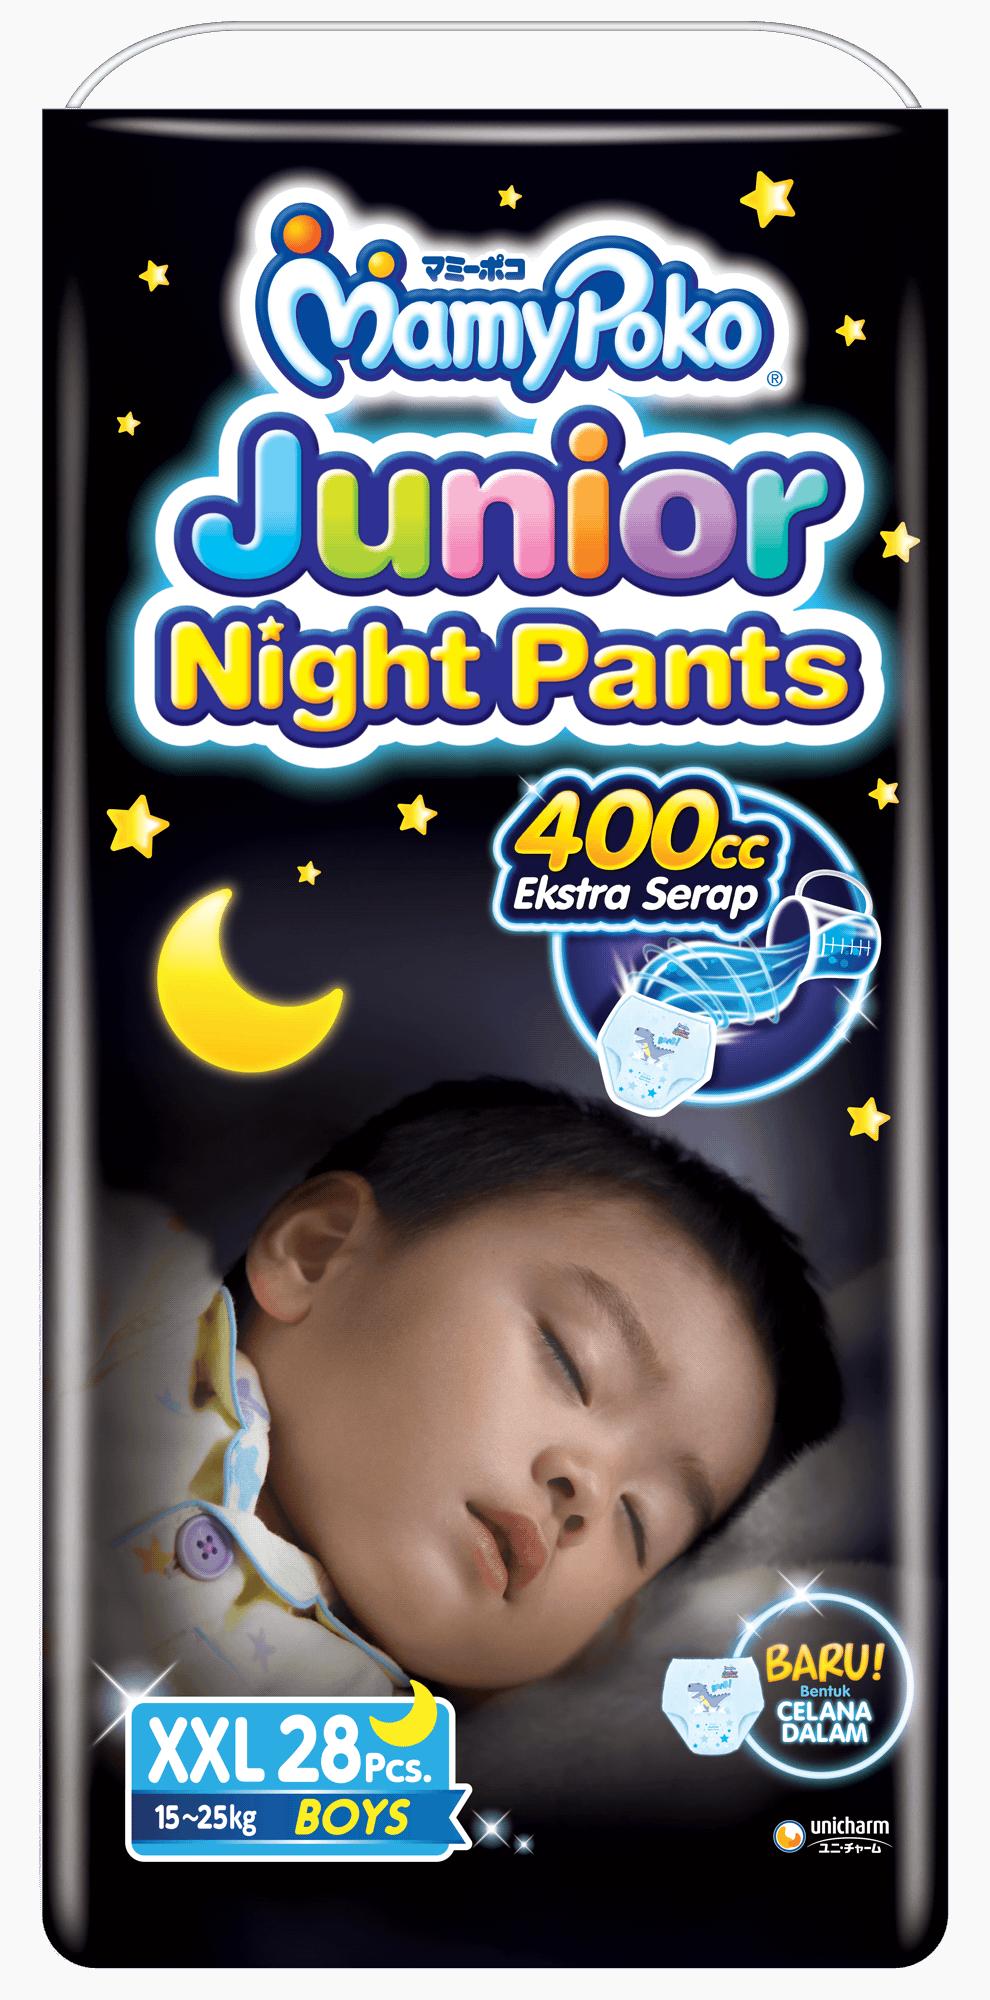 MamyPoko Junior Night Pants (Foto: MamyPoko)